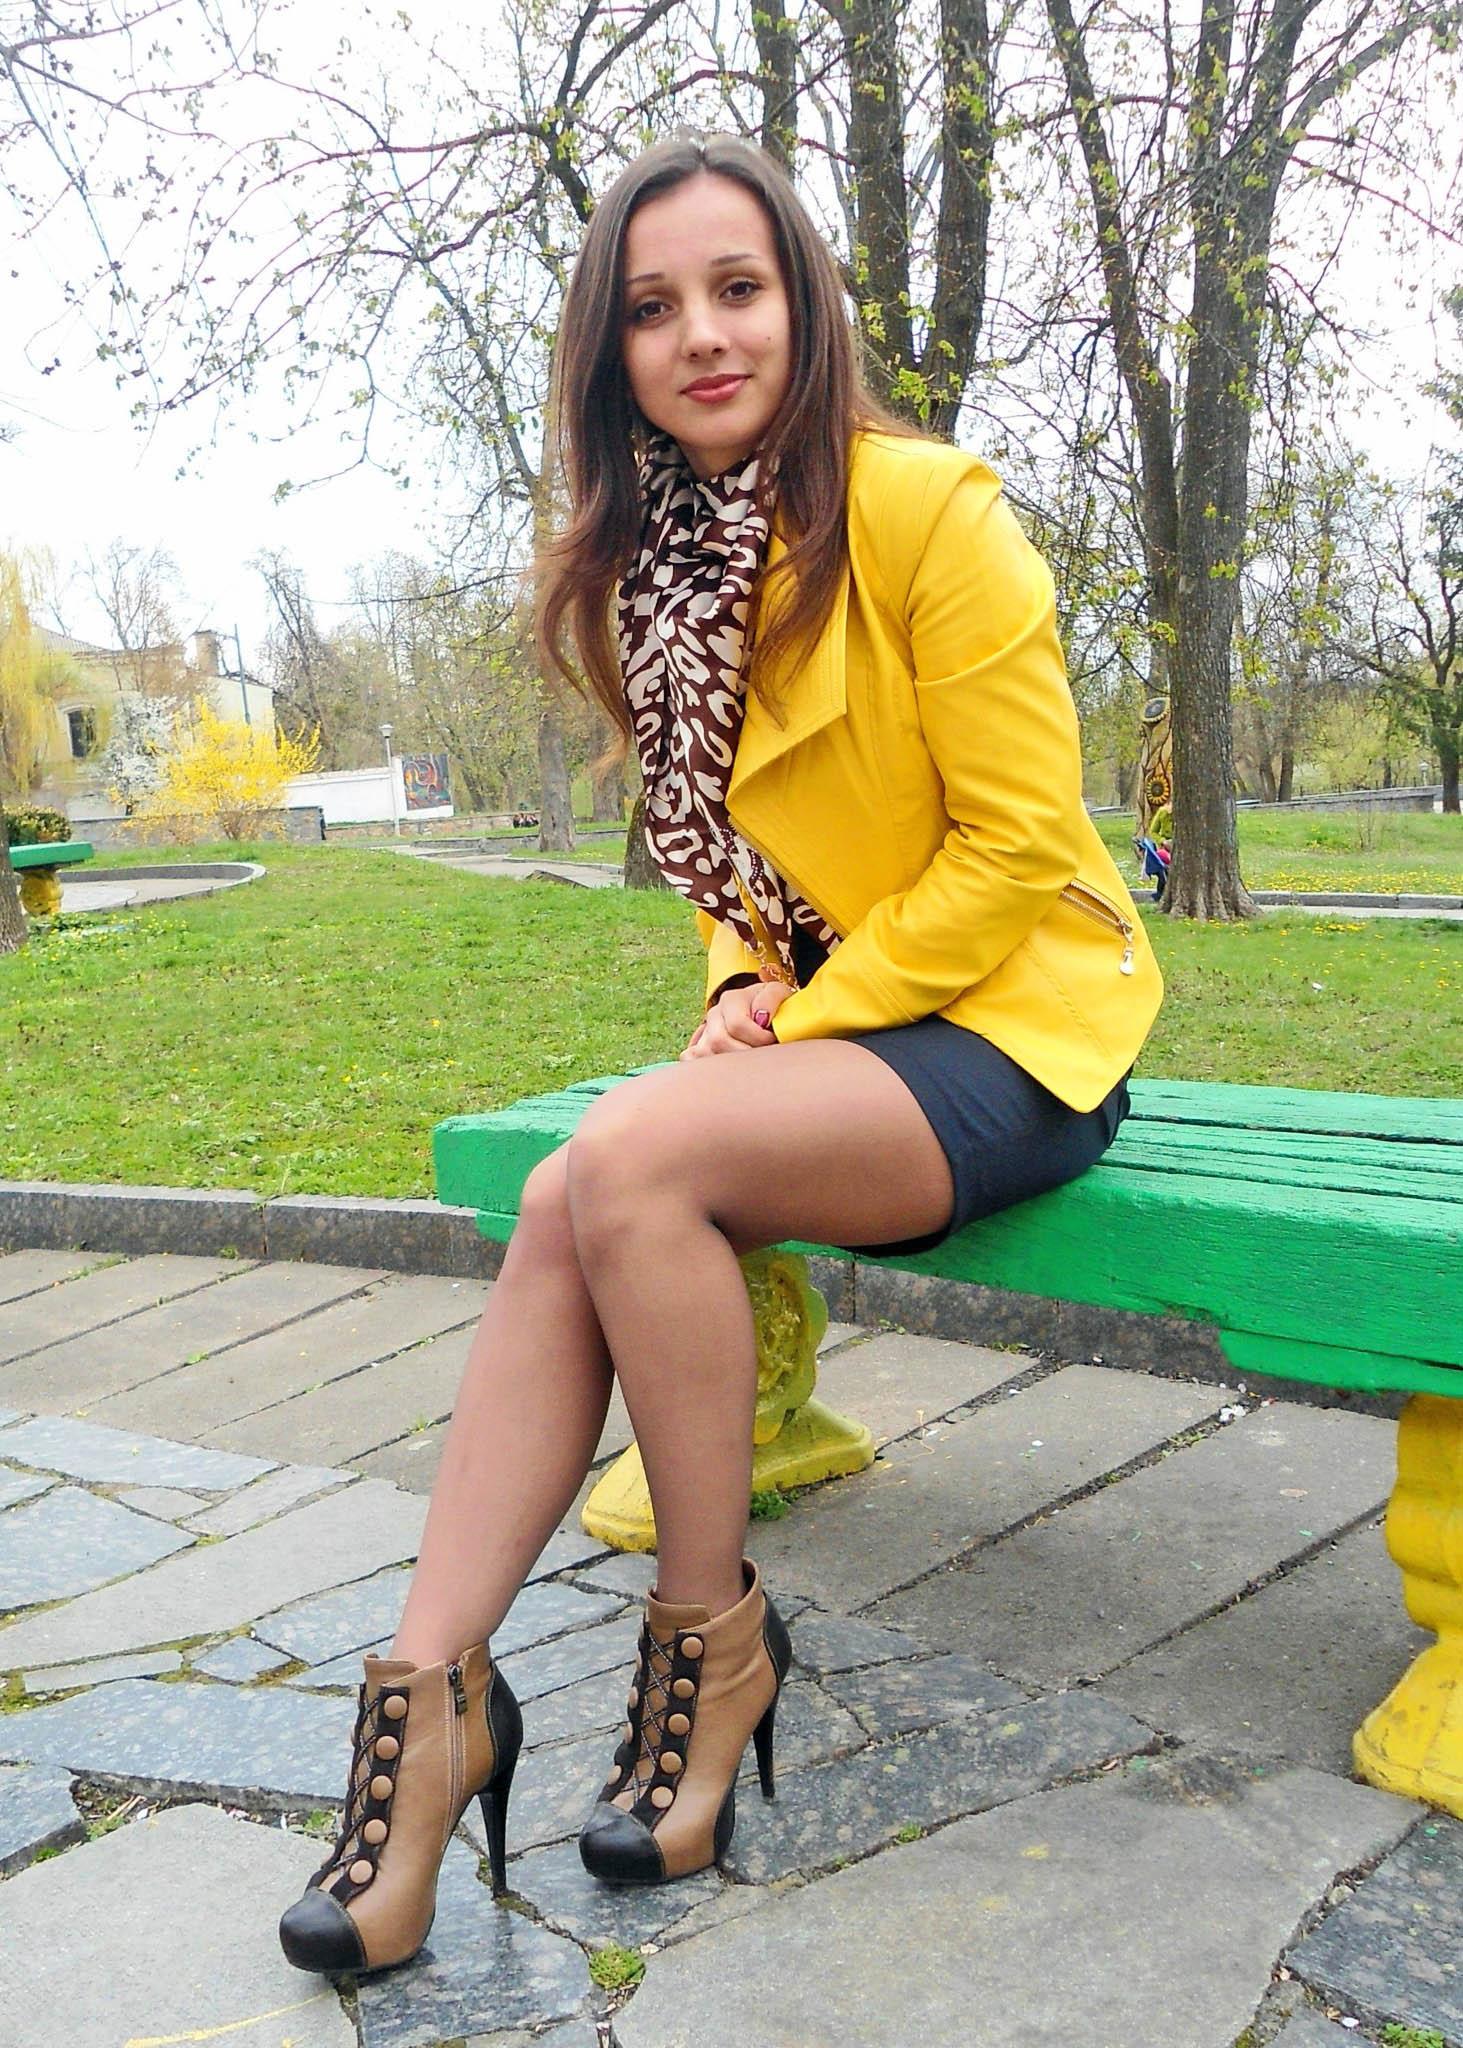 Фото девушки в парке в кожаной мини юбки 7 фотография